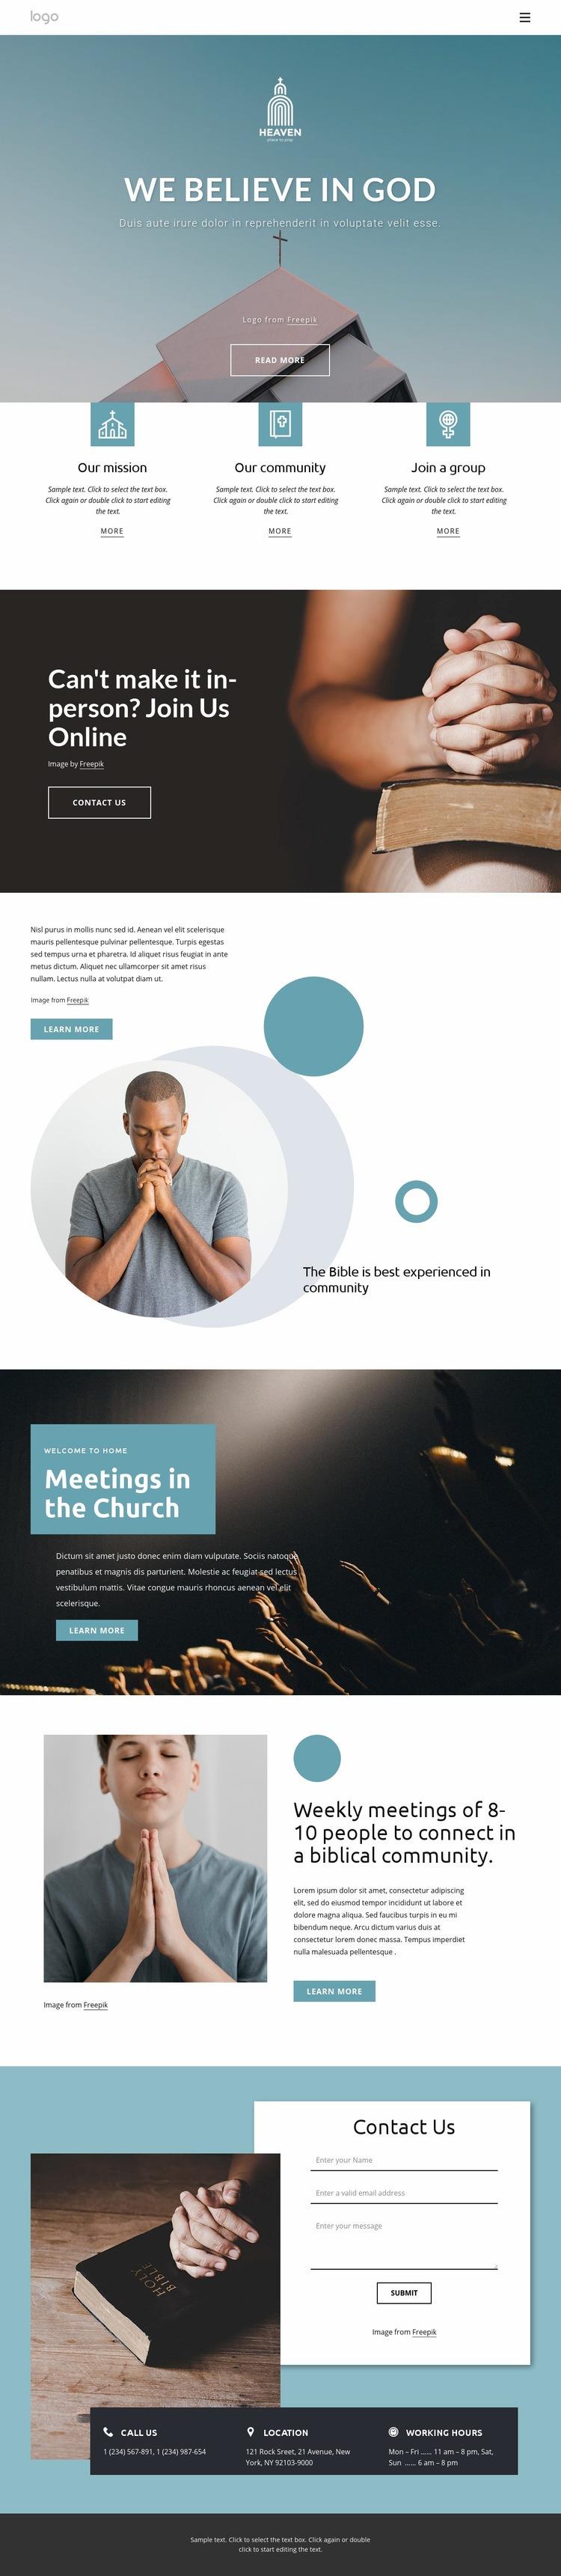 Family friendly church Web Page Designer